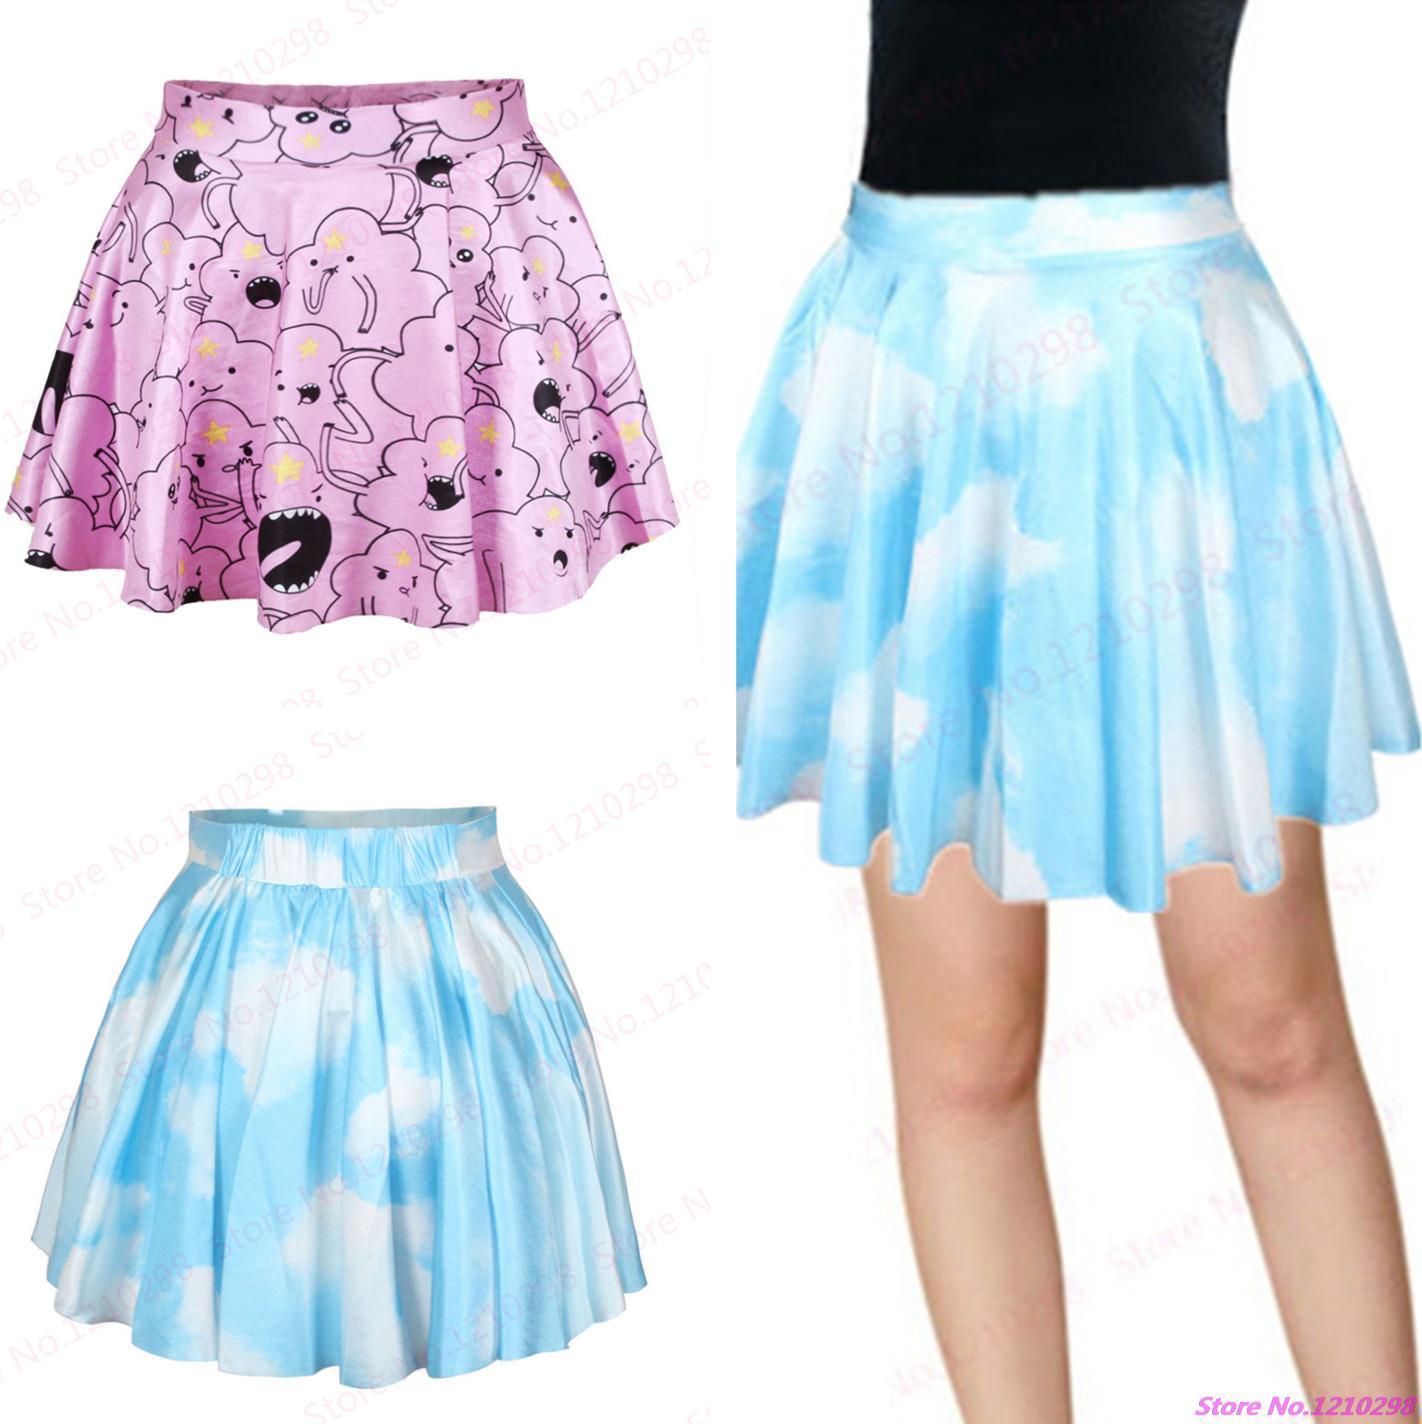 b5d07733f 2019 Wholesale Hot Sale Blue Clouds Sky Mini Skirt 3D Printed Pastel Clouds Women  Pleated Skirts Leisure Sports Slim Kilts Femininas Saias From Masn, ...